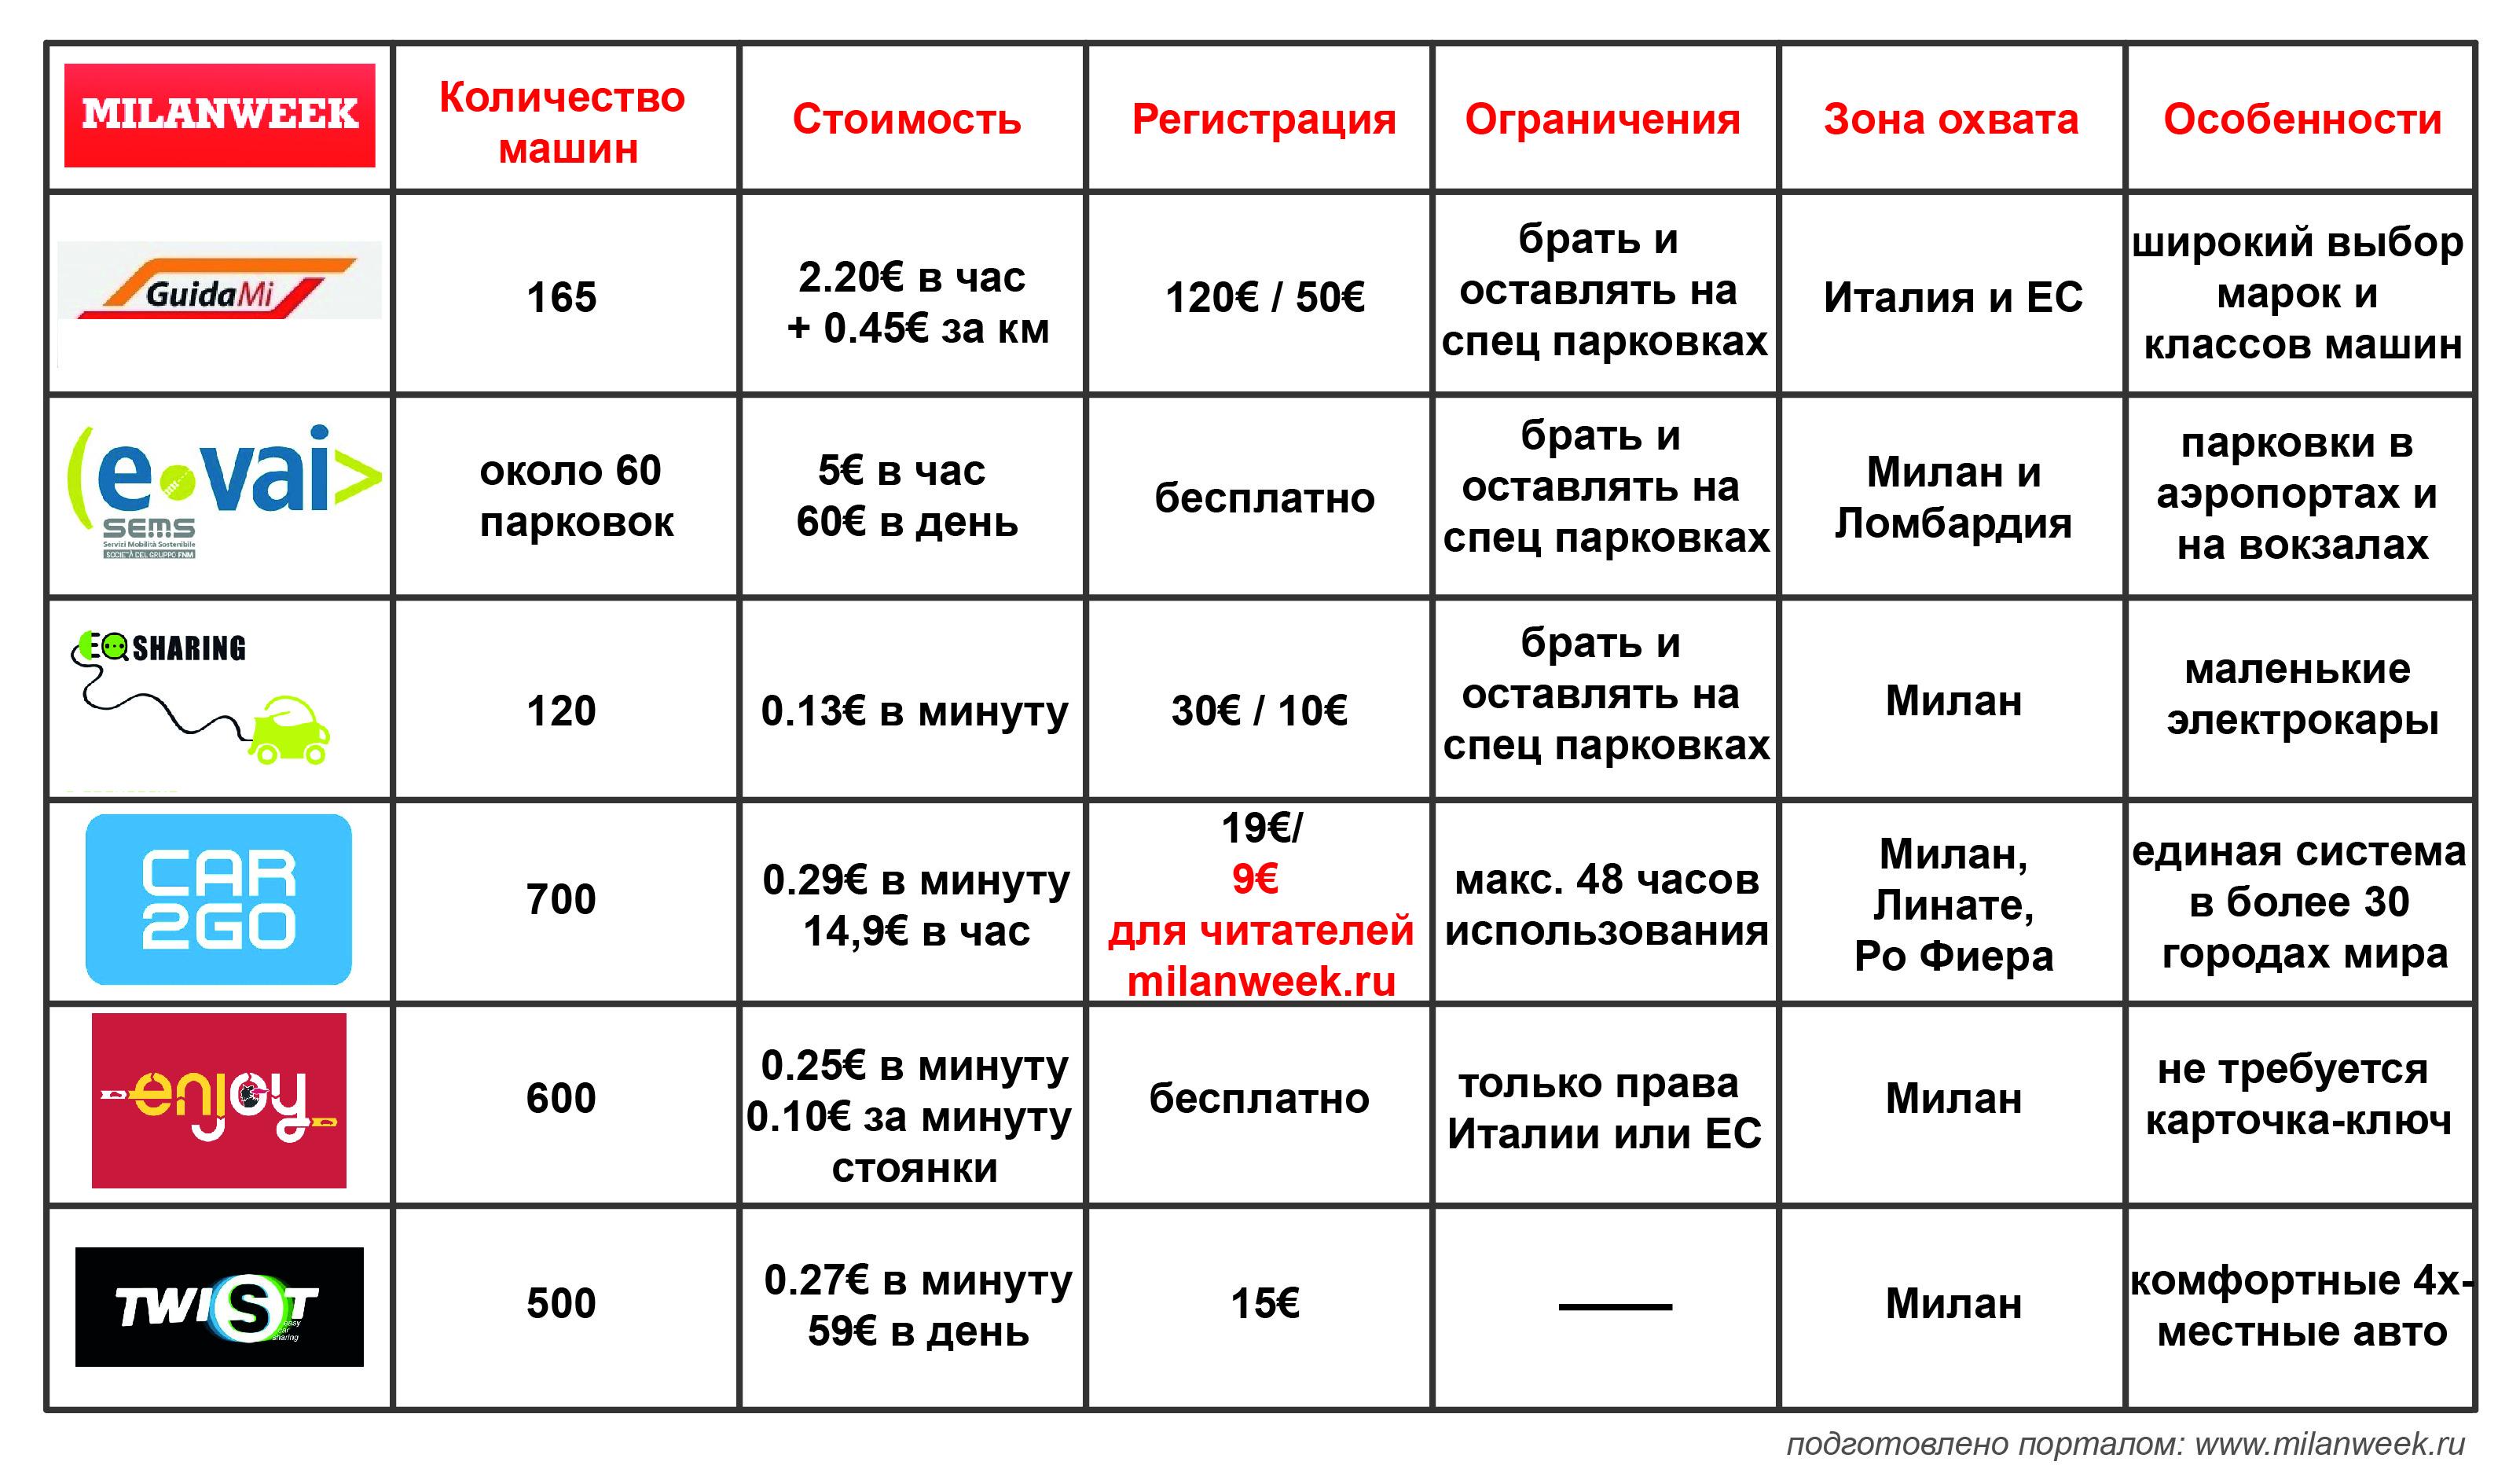 milanweek.ru carsharing analysis 2014 - На чём ездят в Милане? Car sharing обзор